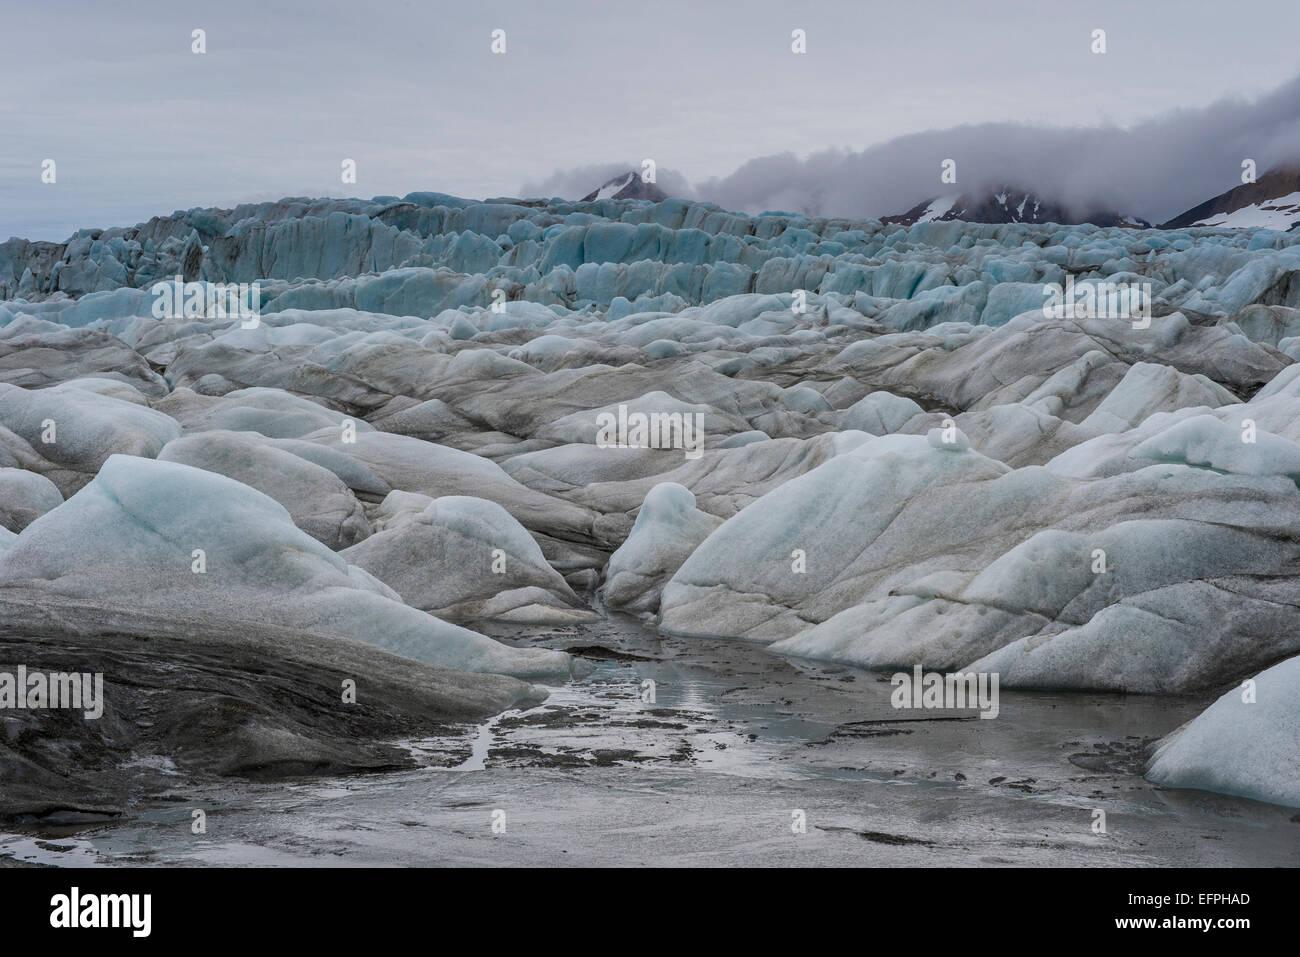 Riesige Gletscher im Hornsund, Svalbard, Arktis, Norwegen, Skandinavien, Europa Stockbild